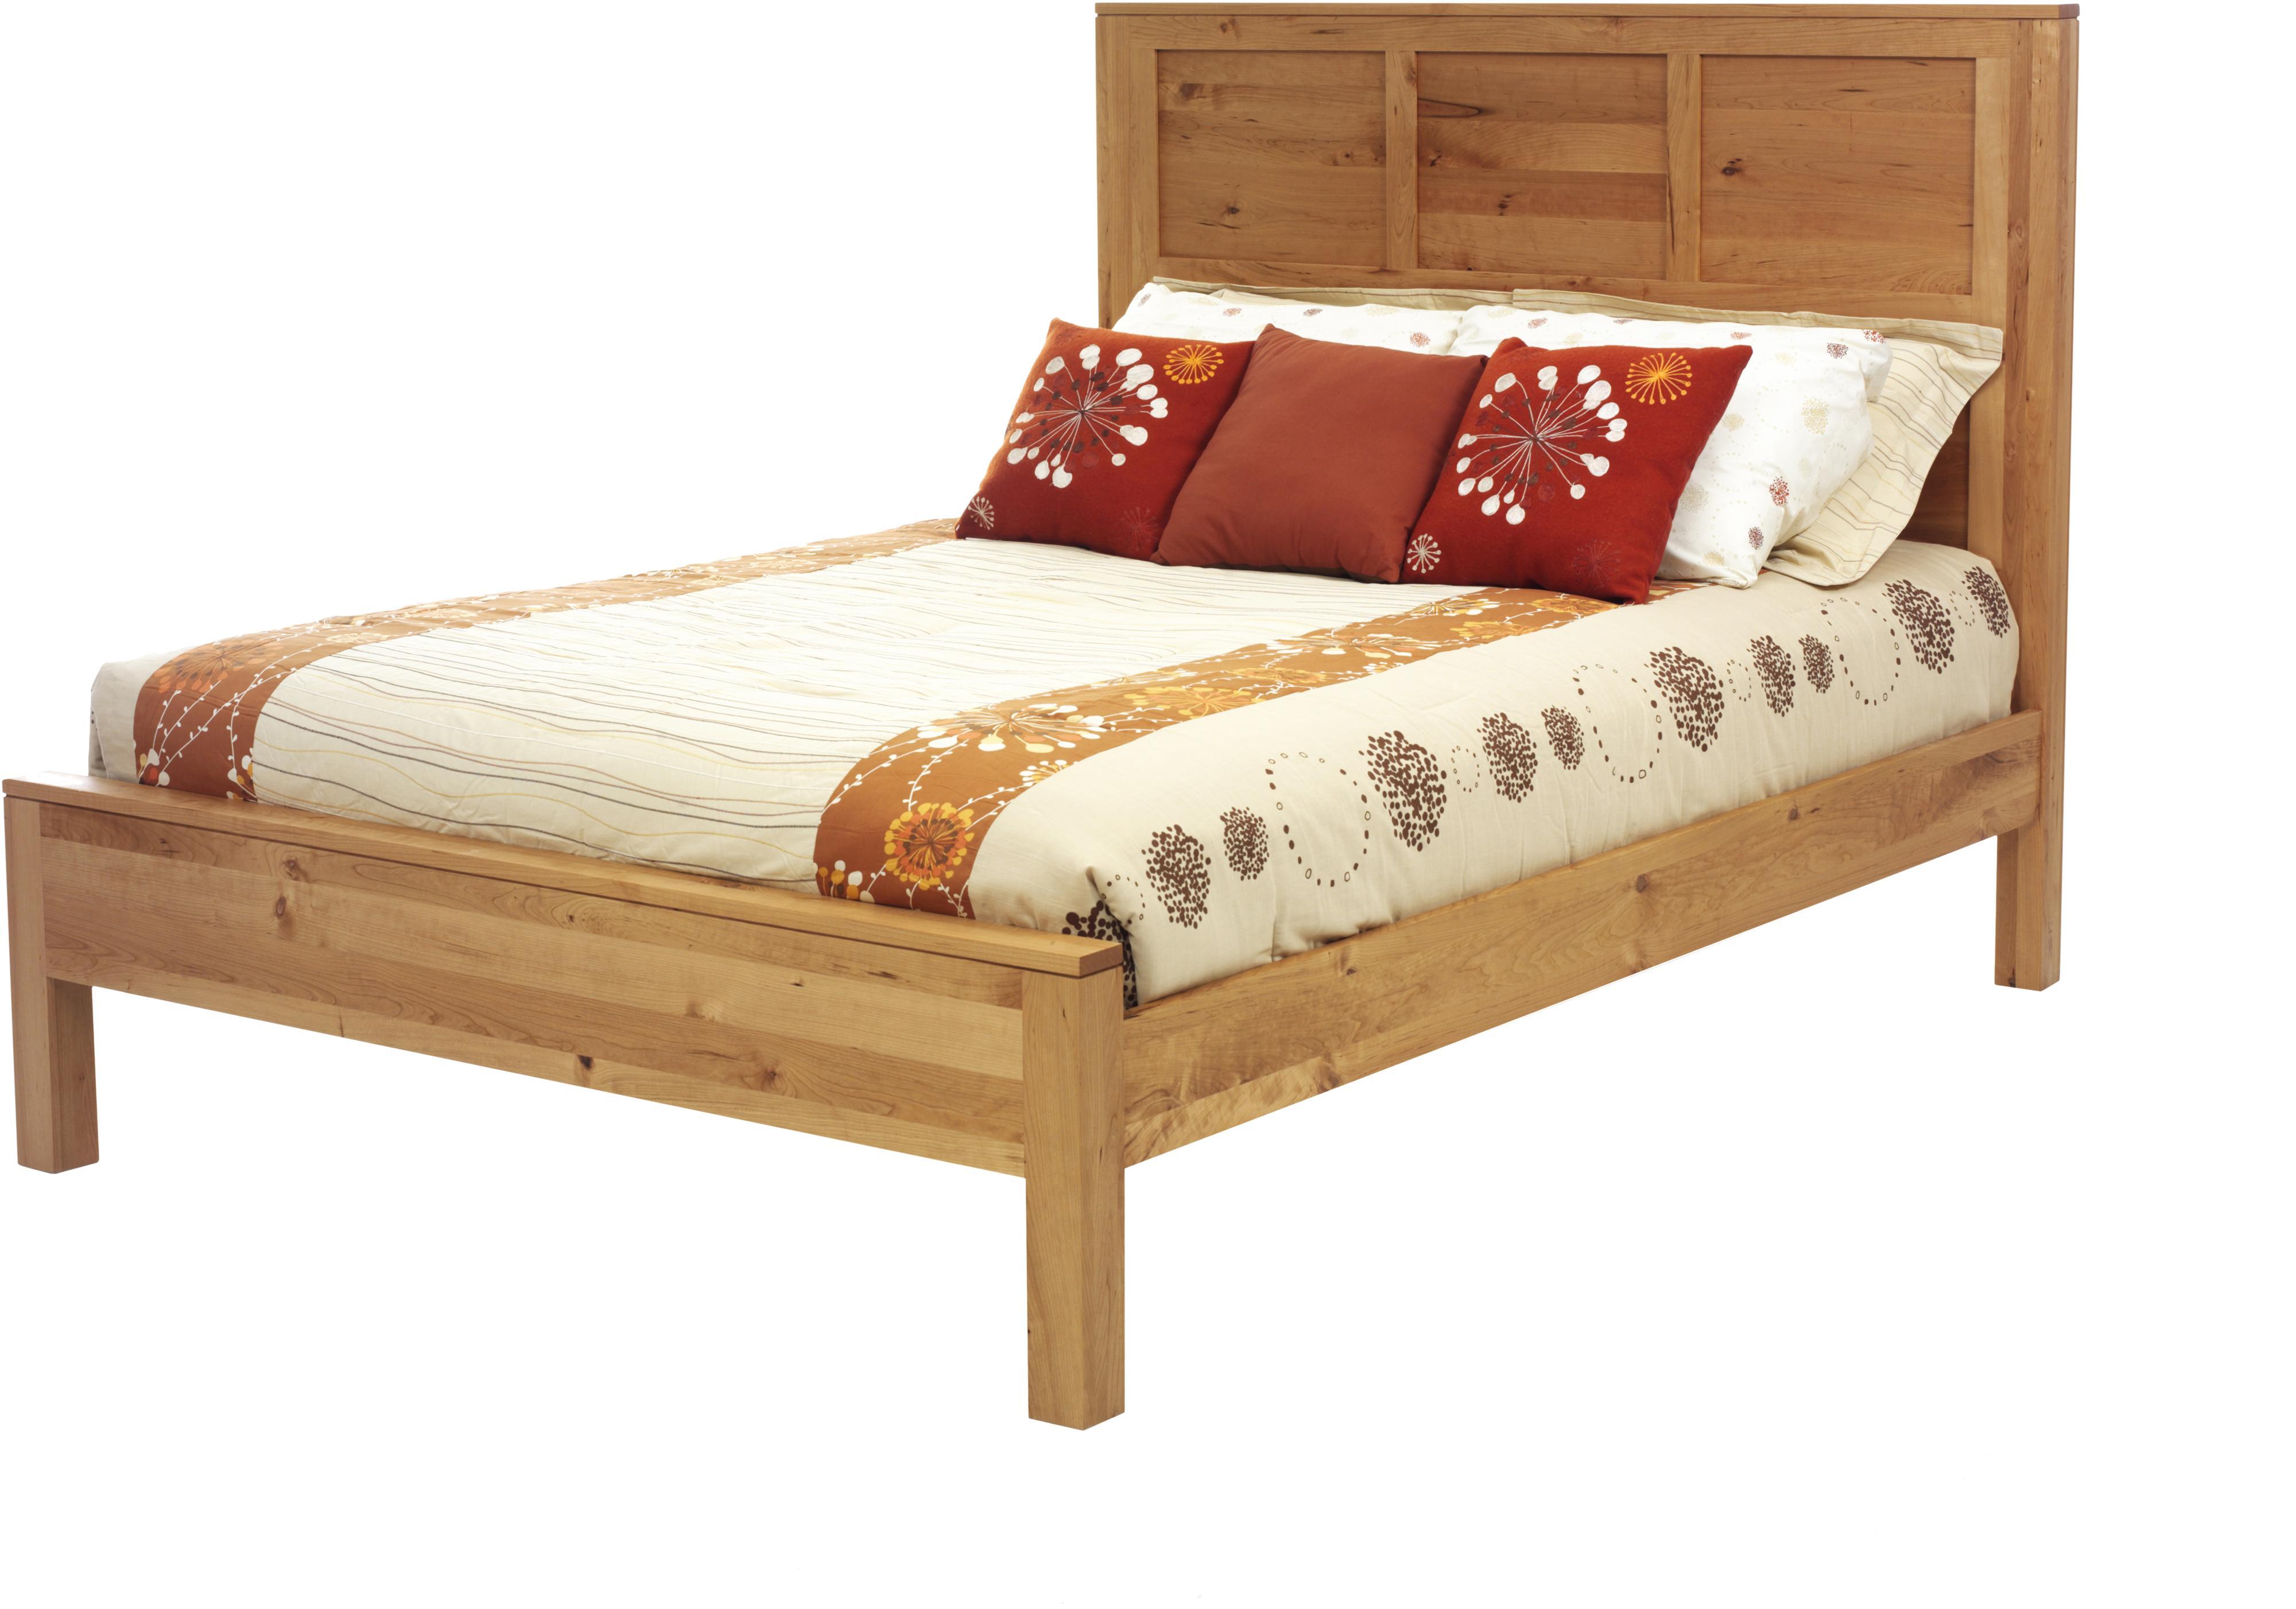 Lynnwood Full Panel Bed at Williams & Kay